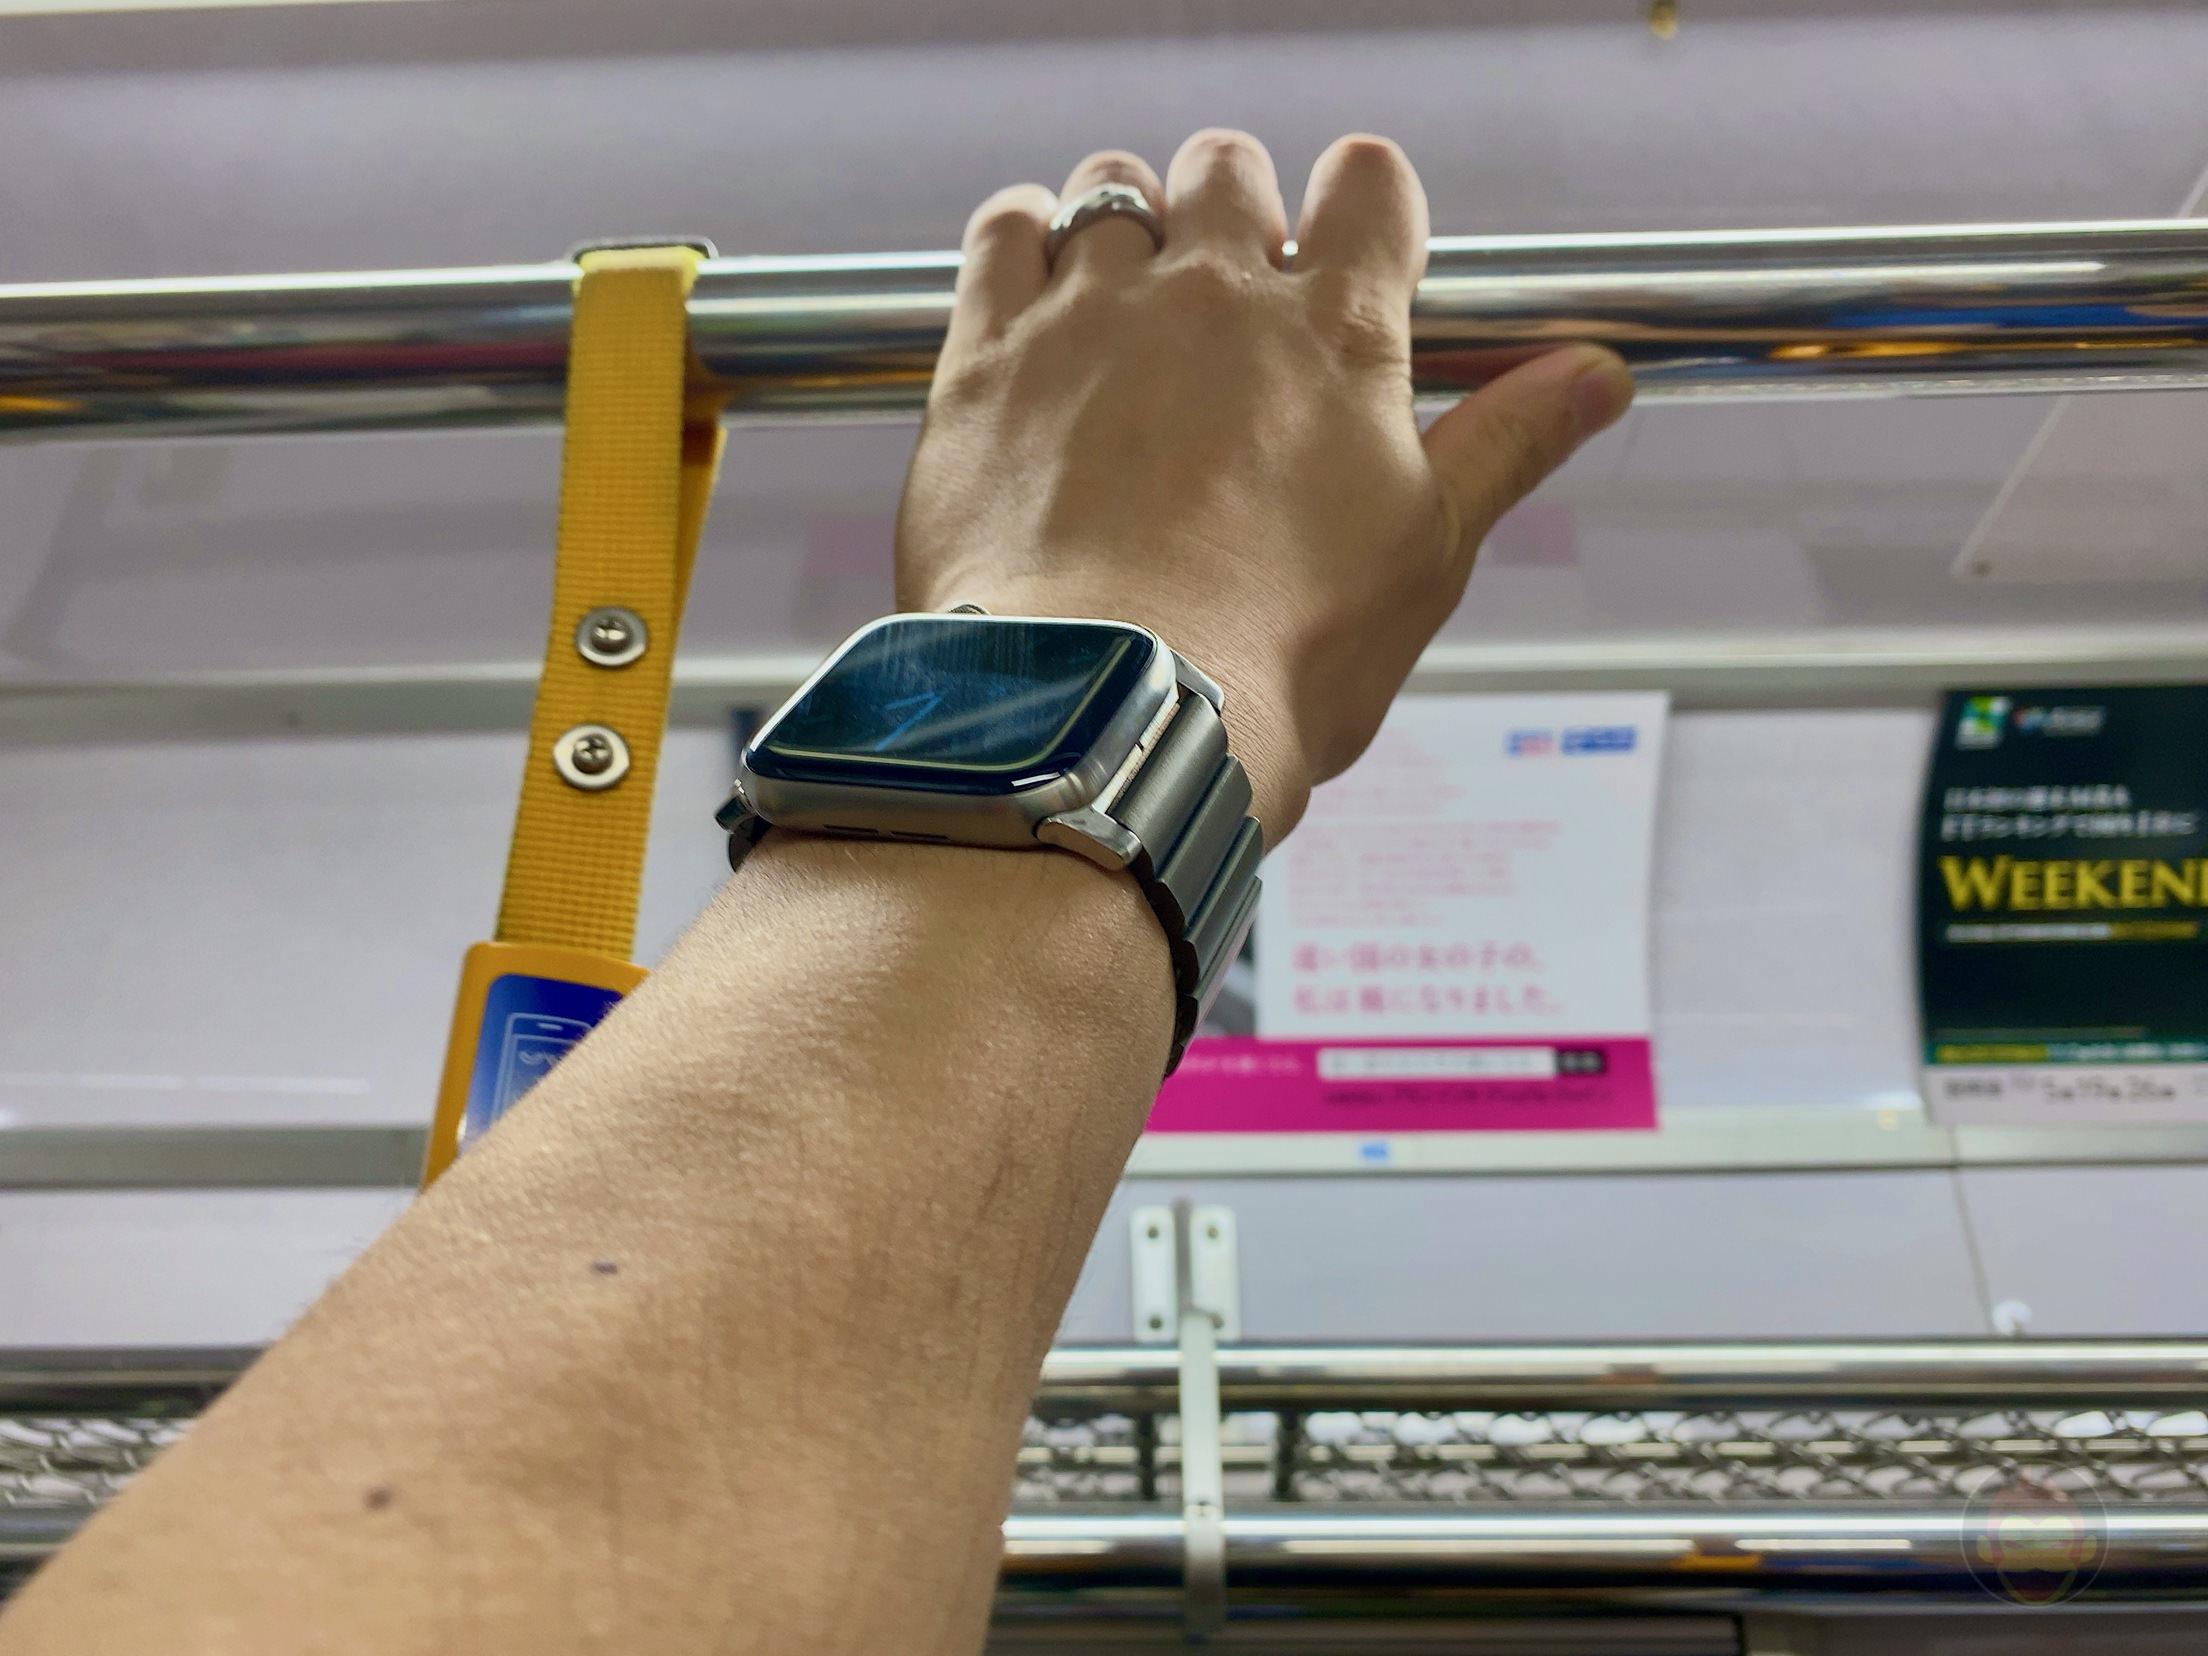 Apple-Watch-Series-5-Review-11.jpeg